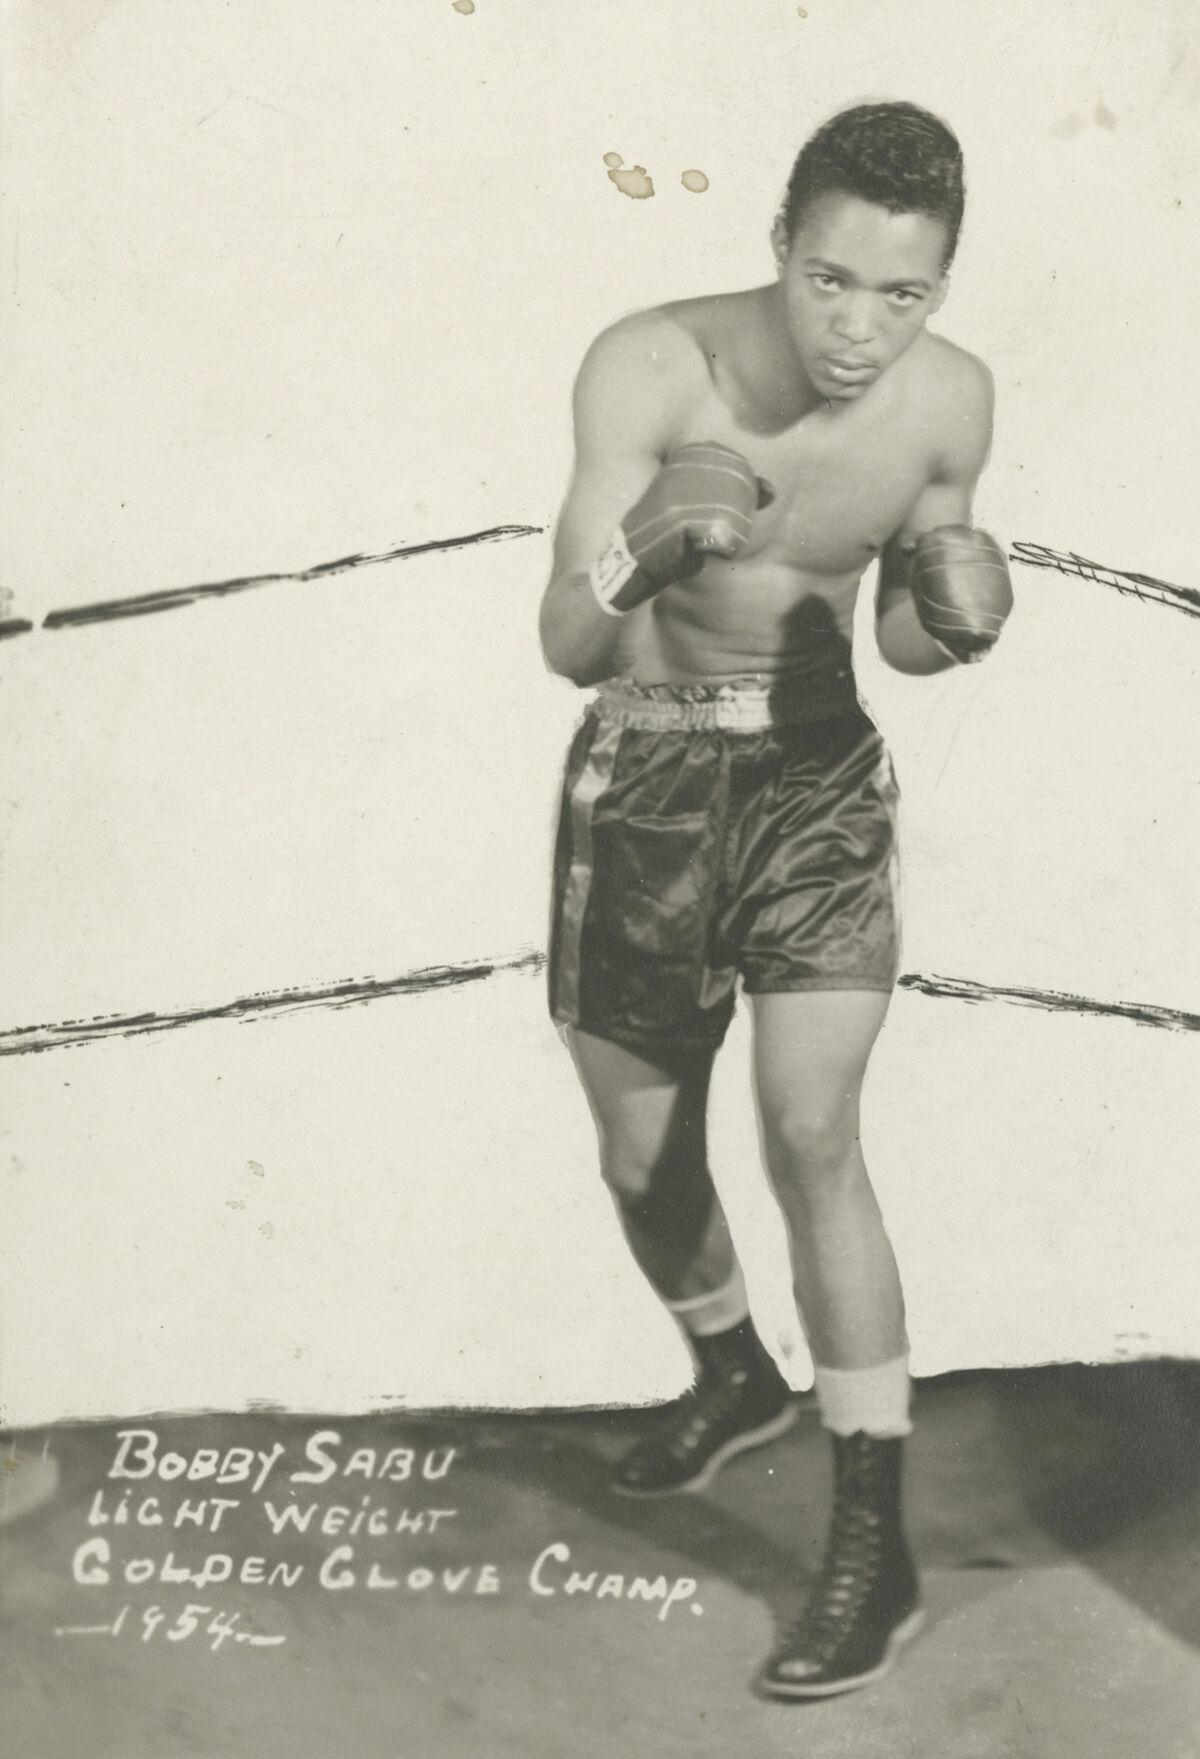 James Van Der Zee, Bobby Sabu, Lightweight Golden Gloves Champ, 1954. © Donna Mussenden Van Der Zee. Courtesy of Howard Greenberg Gallery, New York.